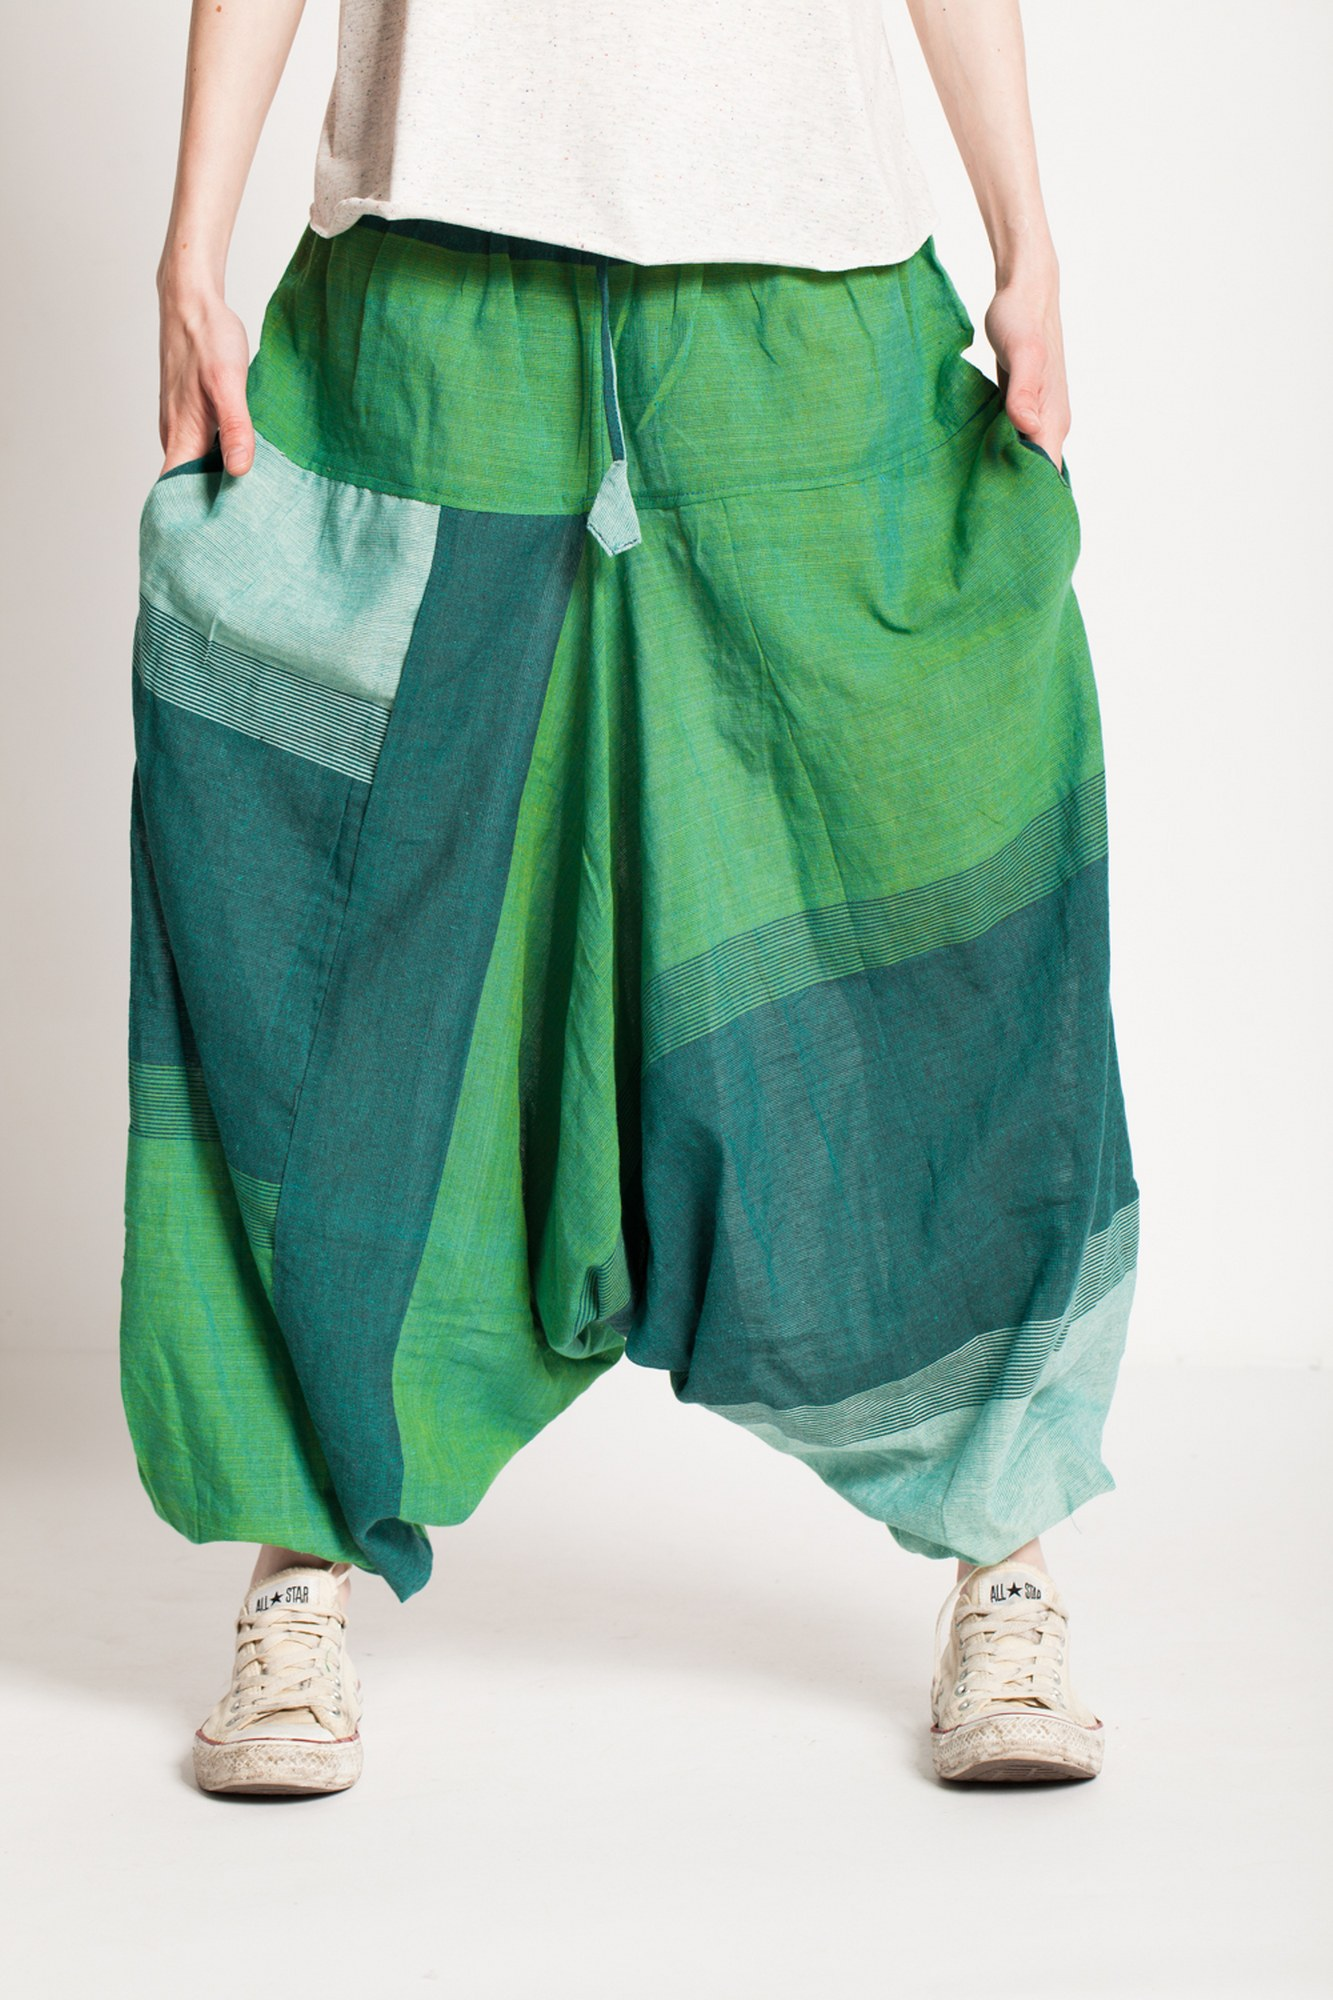 Salvari unisex green